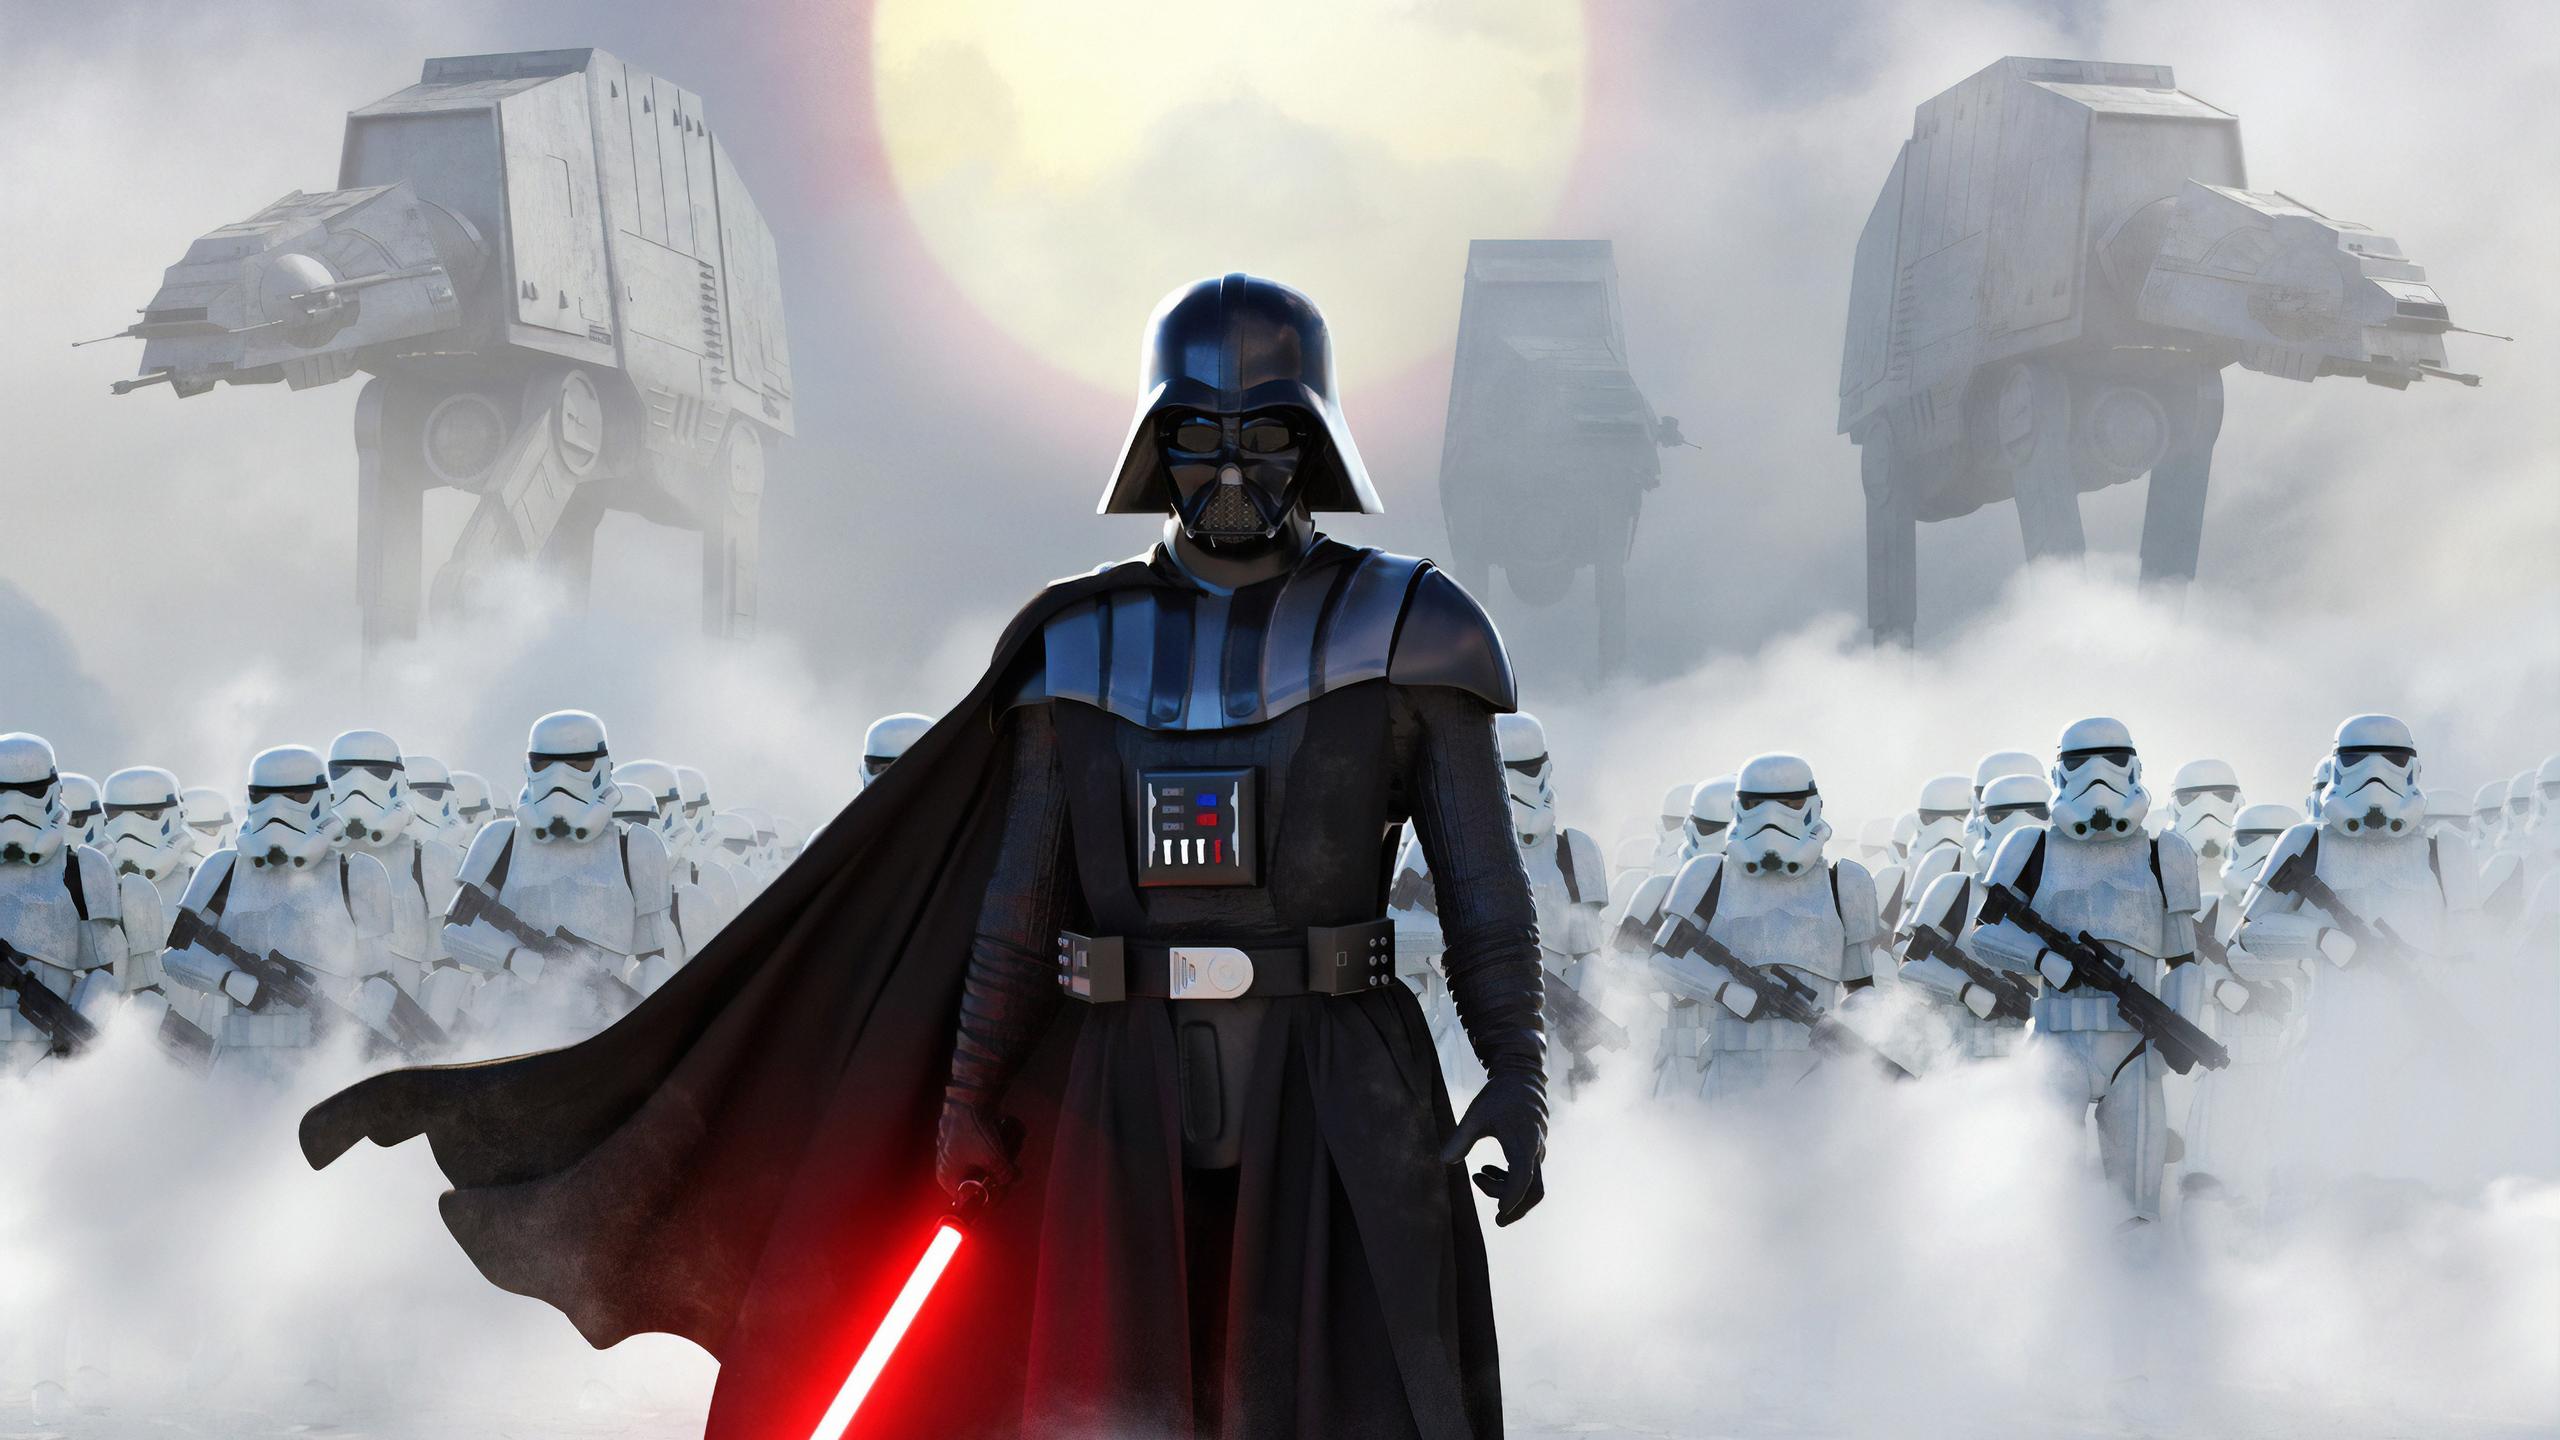 2560x1440 4k Darth Vader 1440p Resolution Hd 4k Wallpapers Images